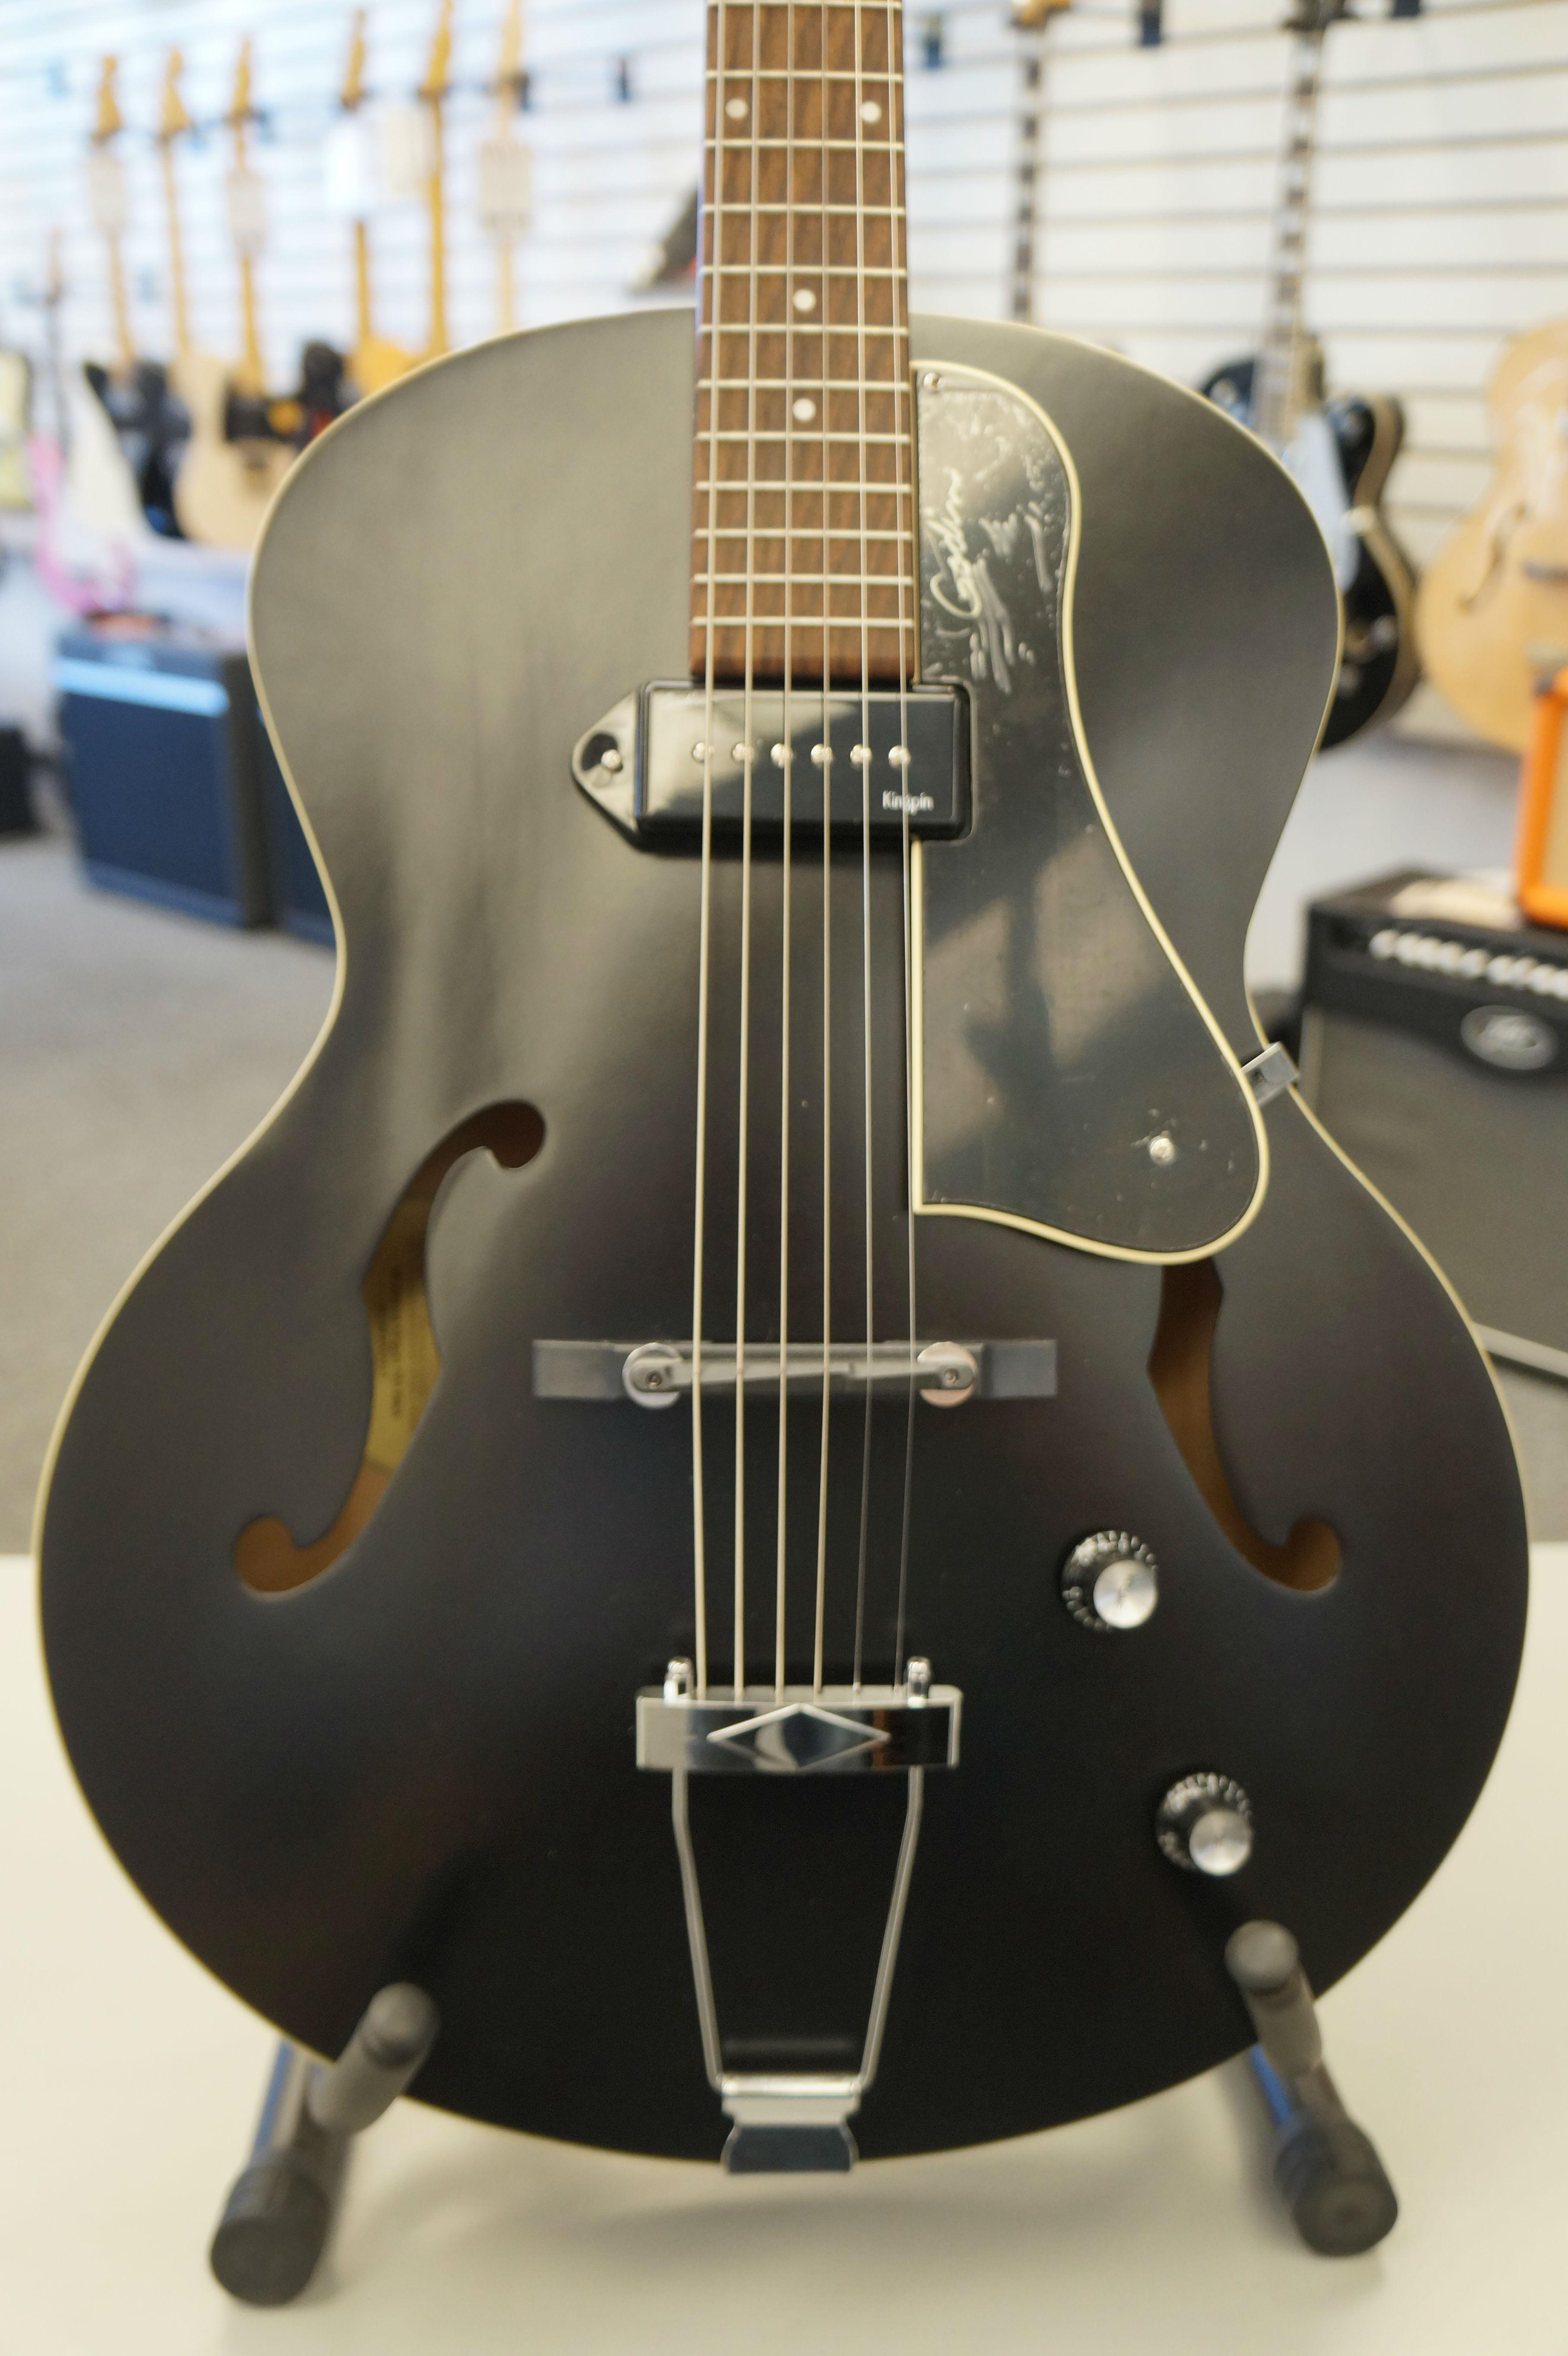 Godin 5th Avenue Kingpin Archtop Acoustic Guitar Black